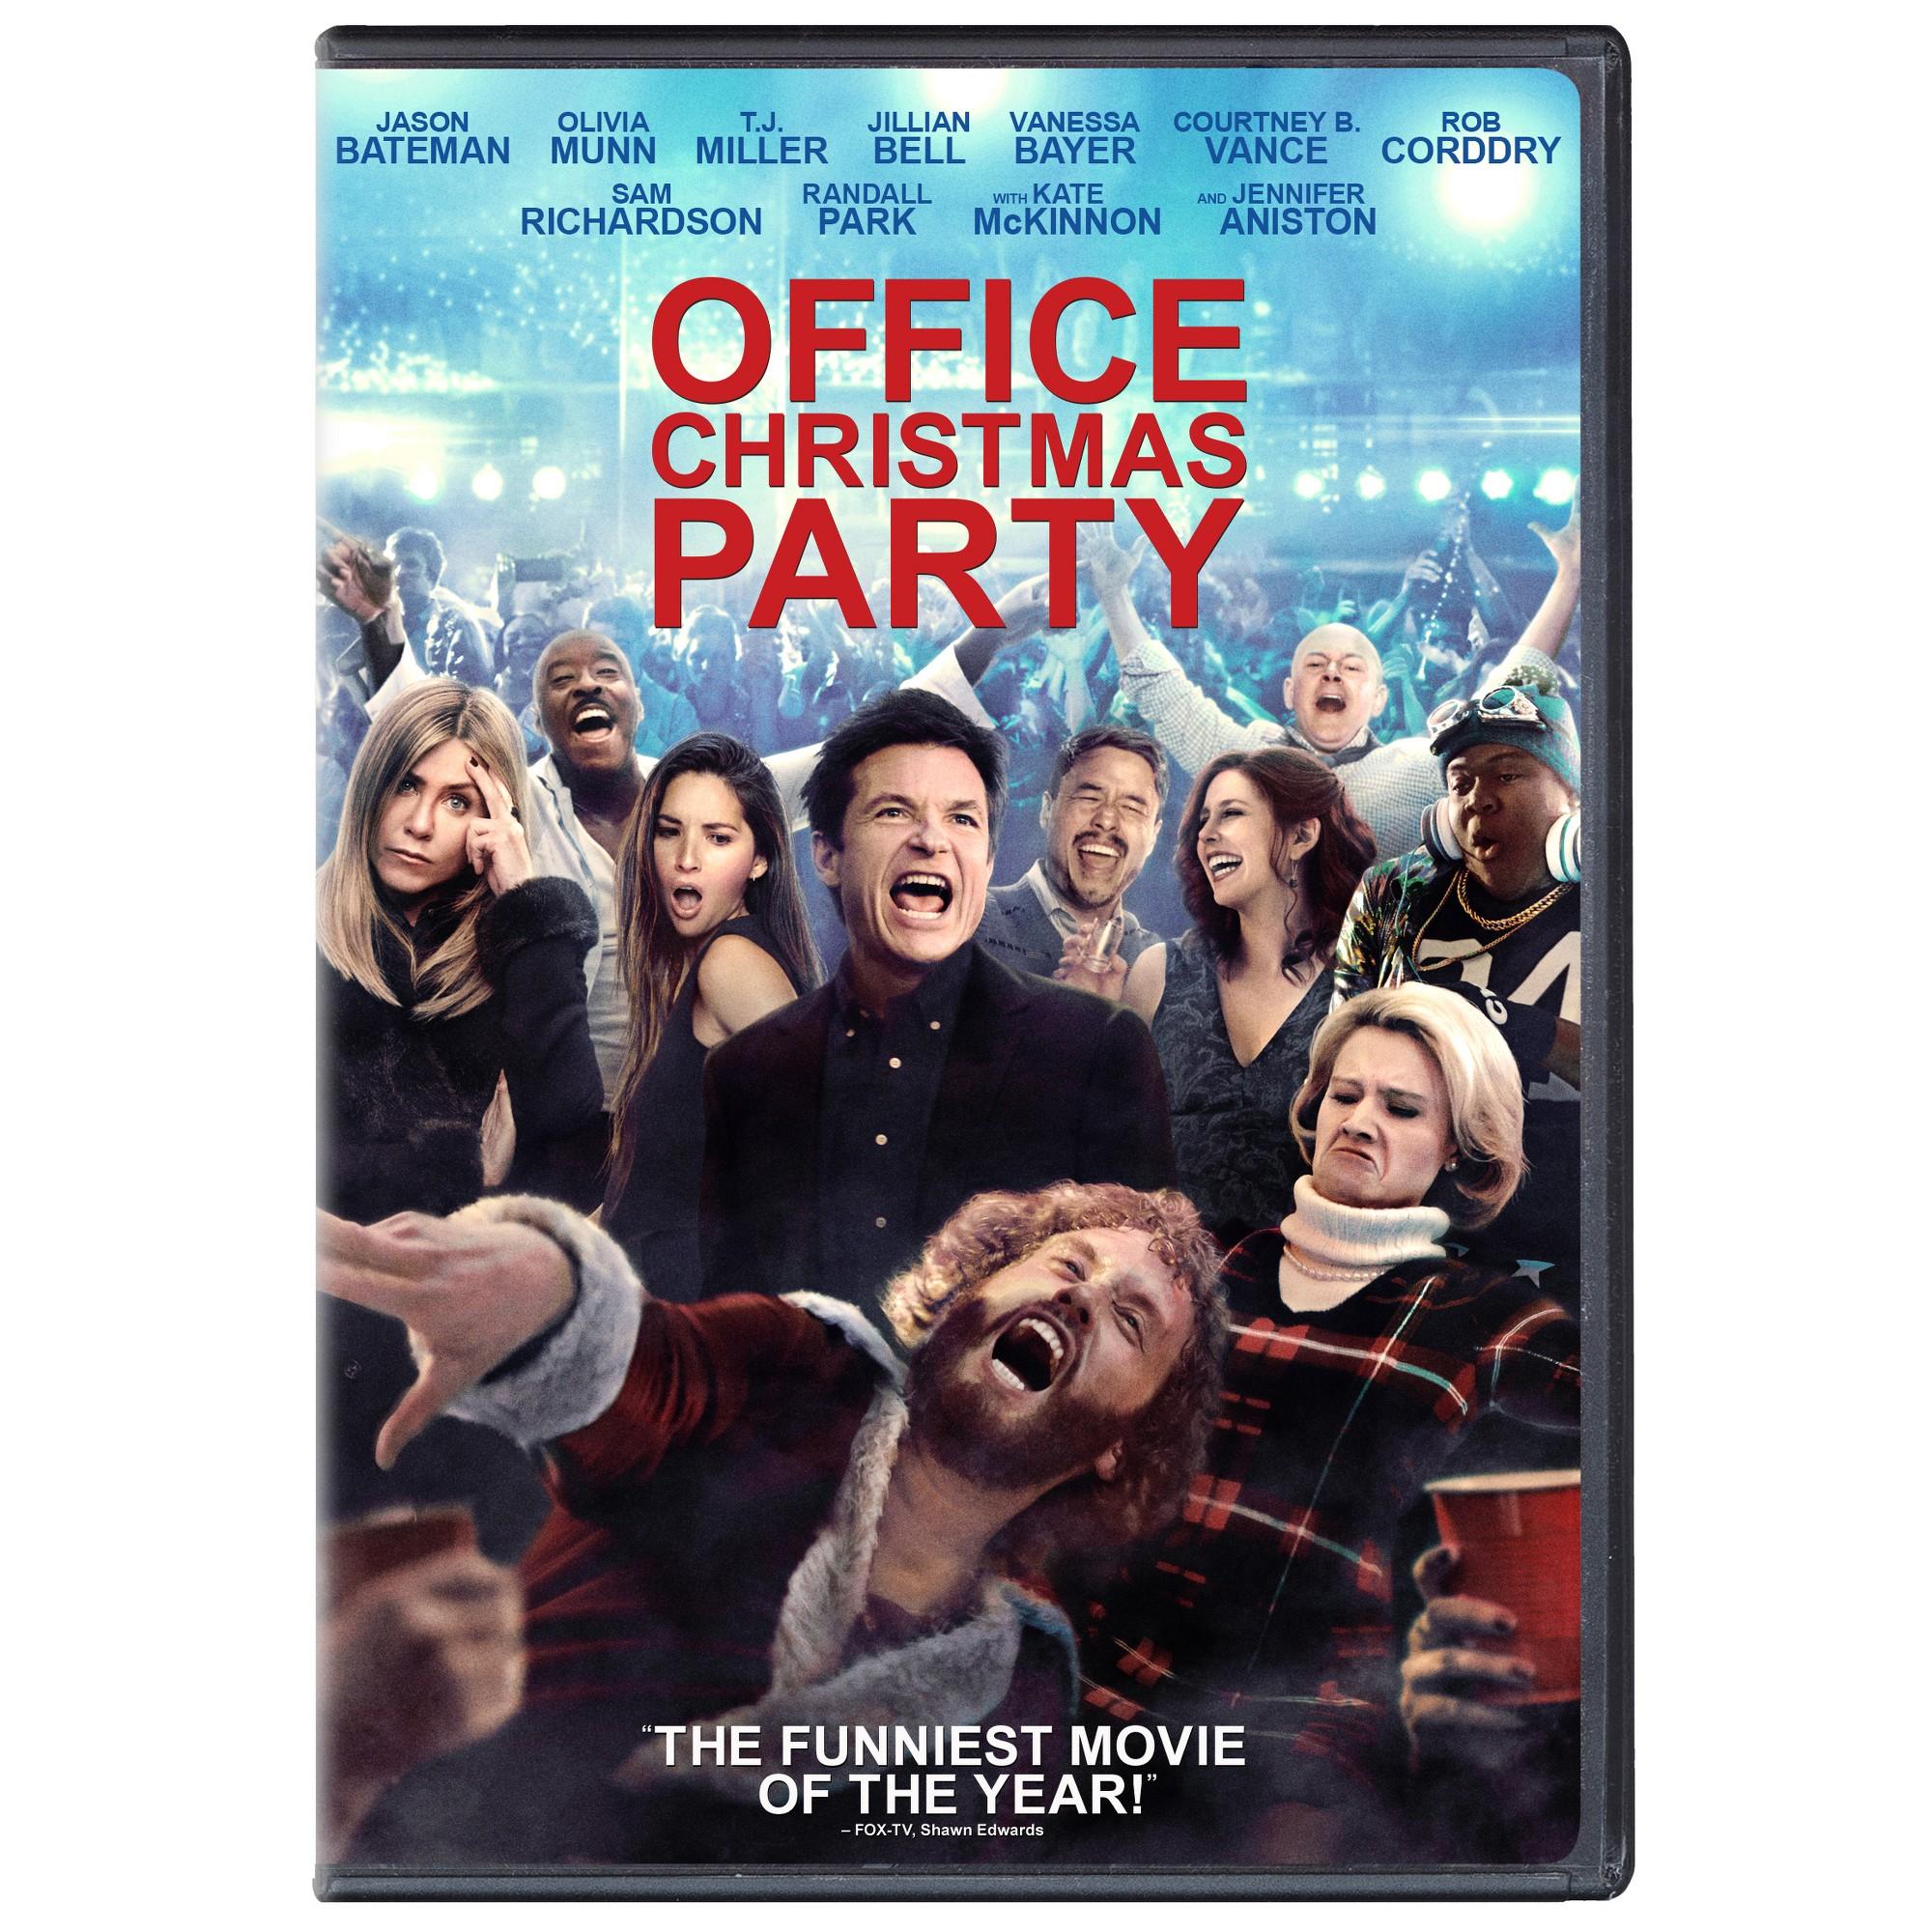 office christmas party putlocker view invite